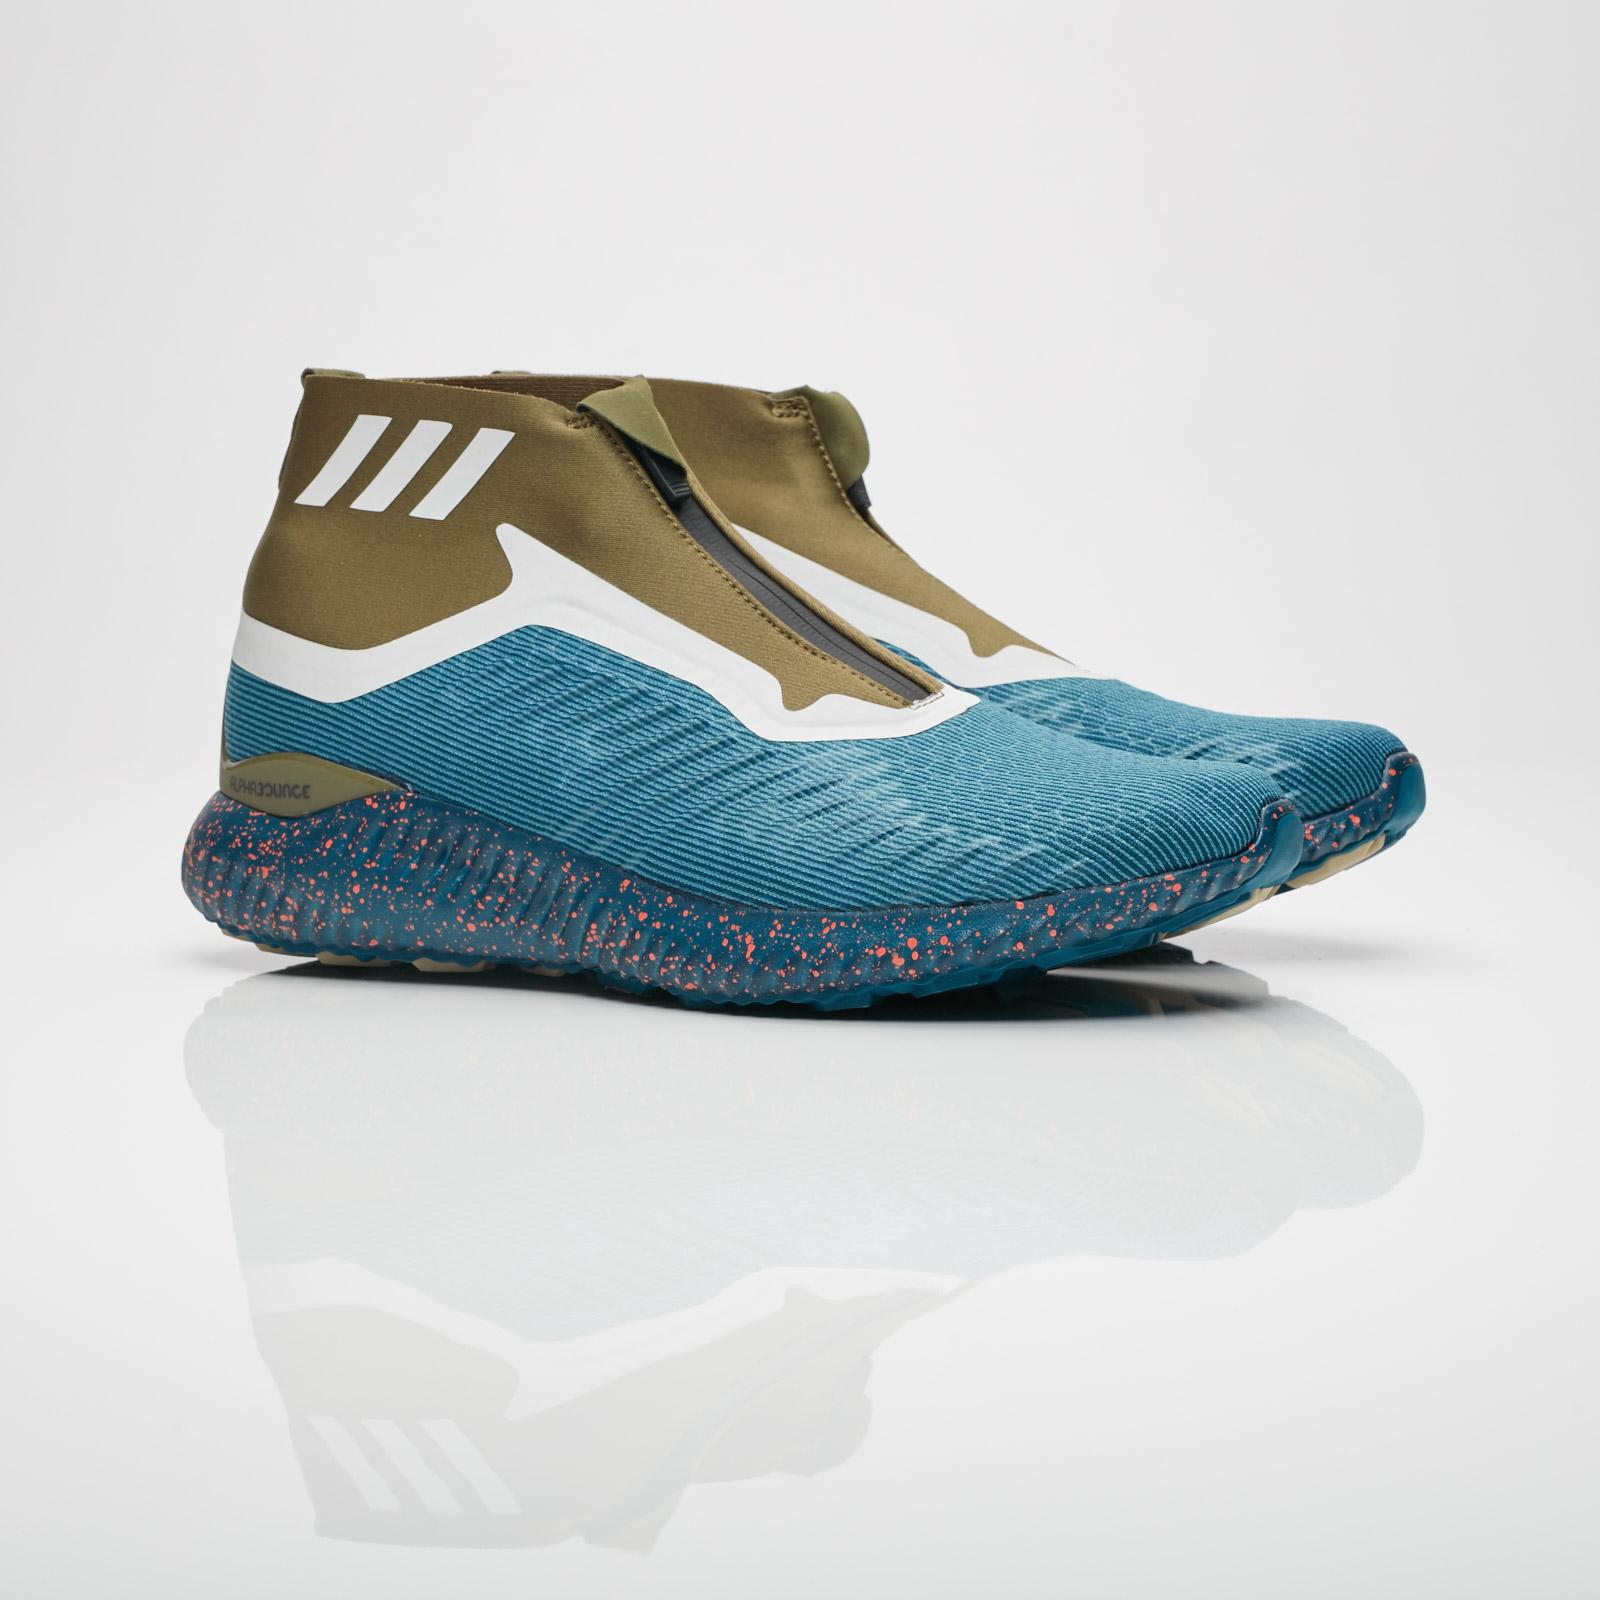 1fbb227be1ca7 adidas Alphabounce Zip M - Bw1387 - Sneakersnstuff